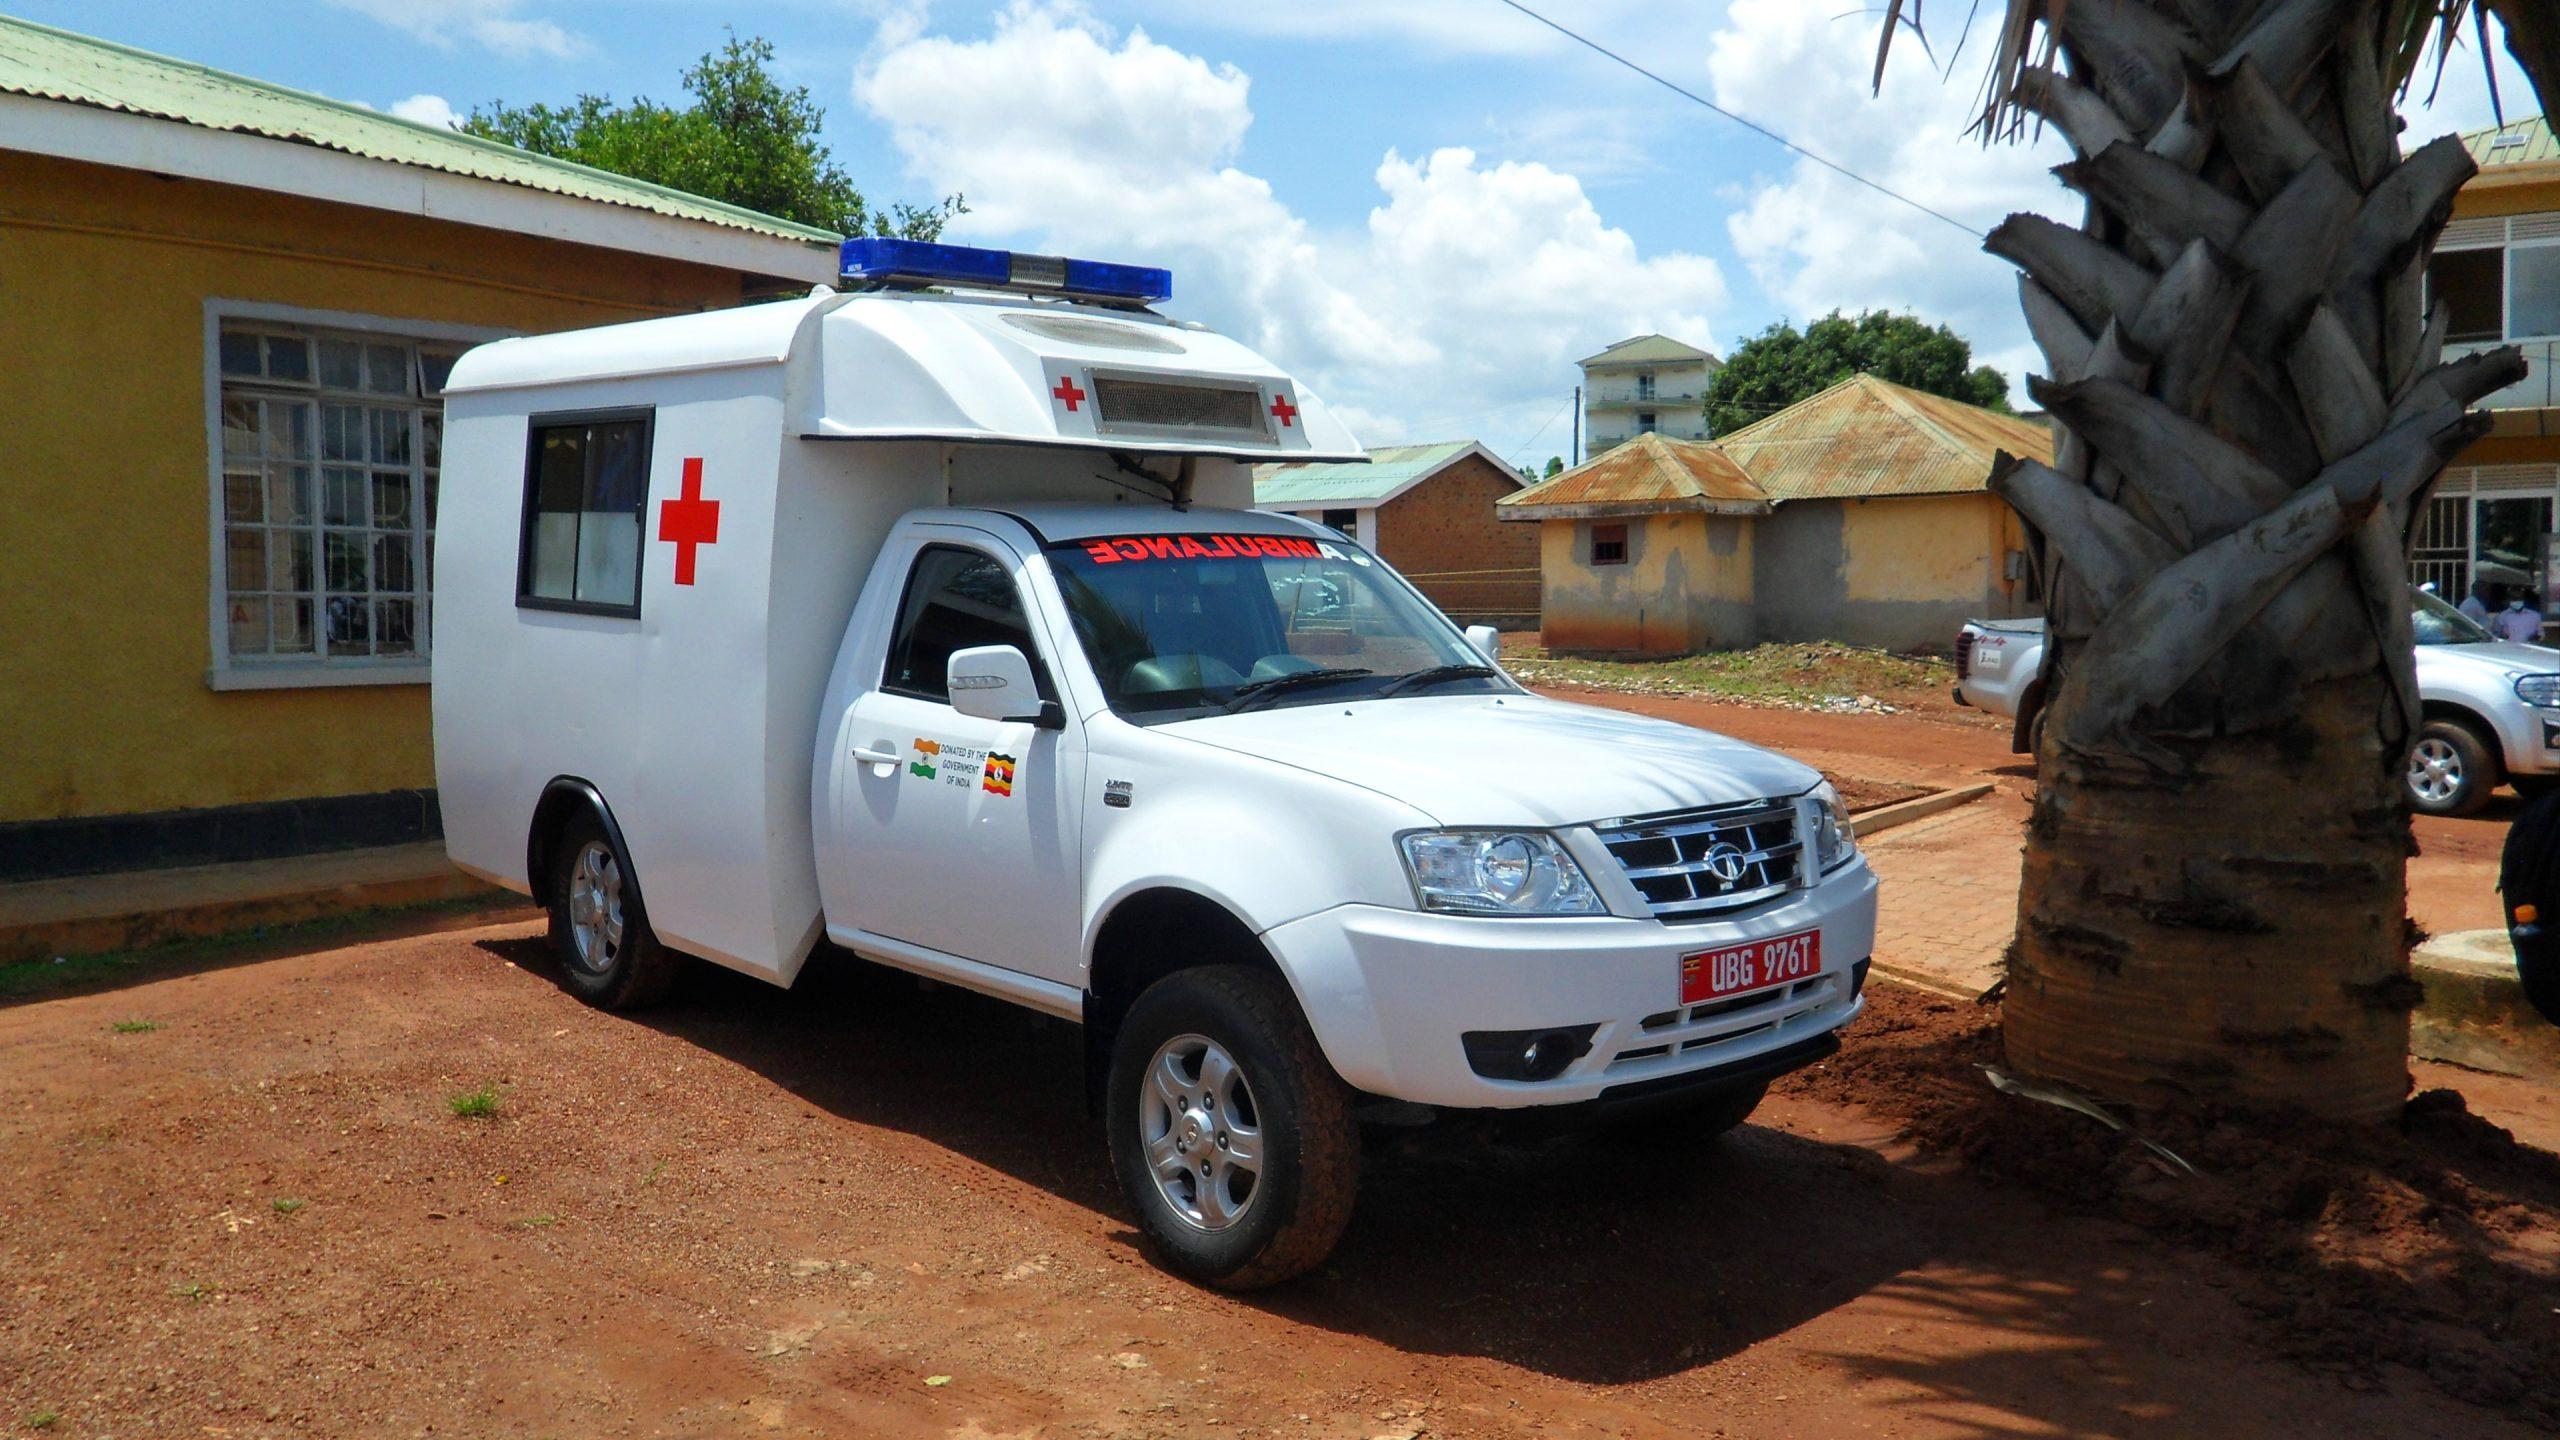 Few People Calling Red Cross Highway Ambulance